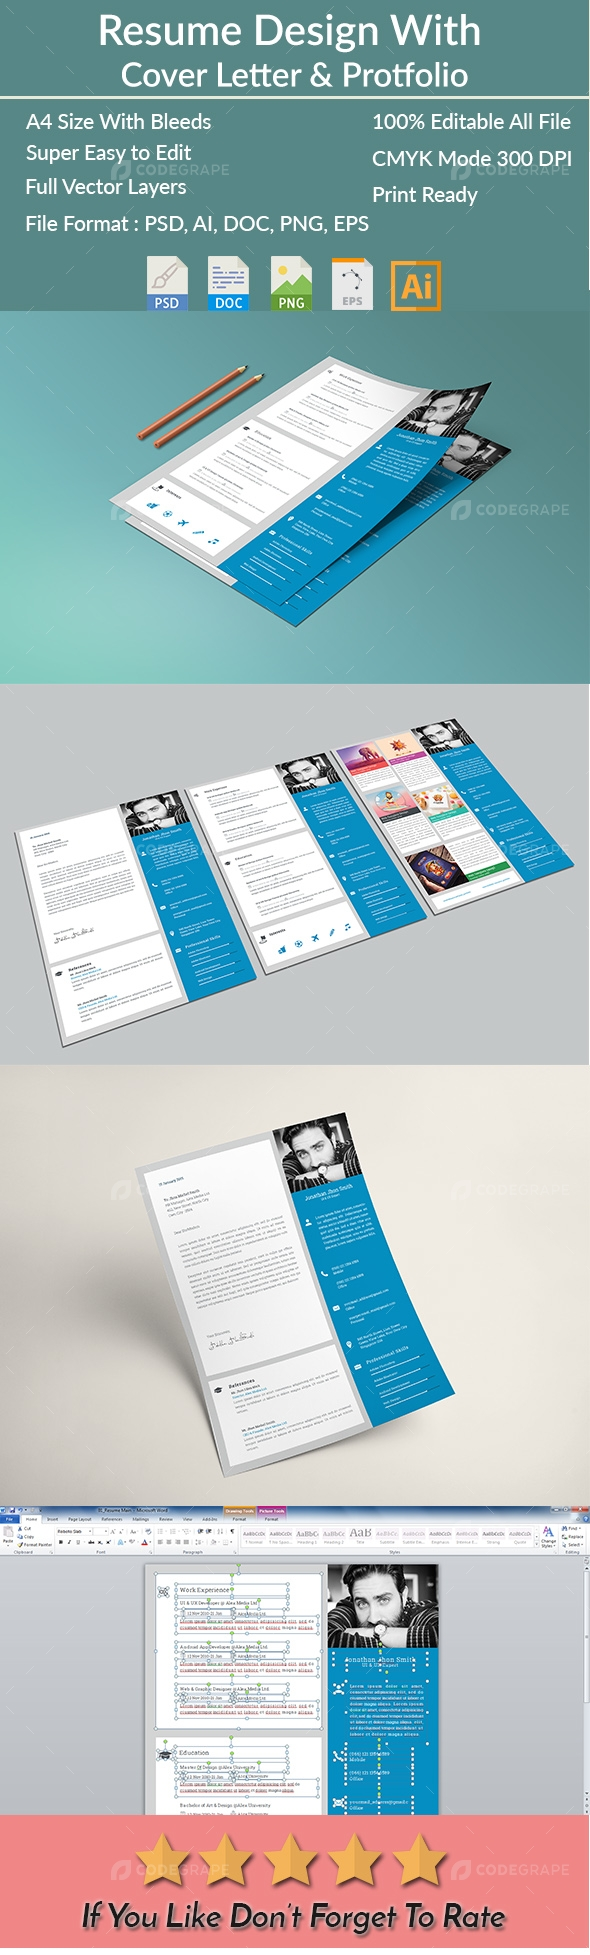 Resume I CV  with Cover Letter & Portfolio